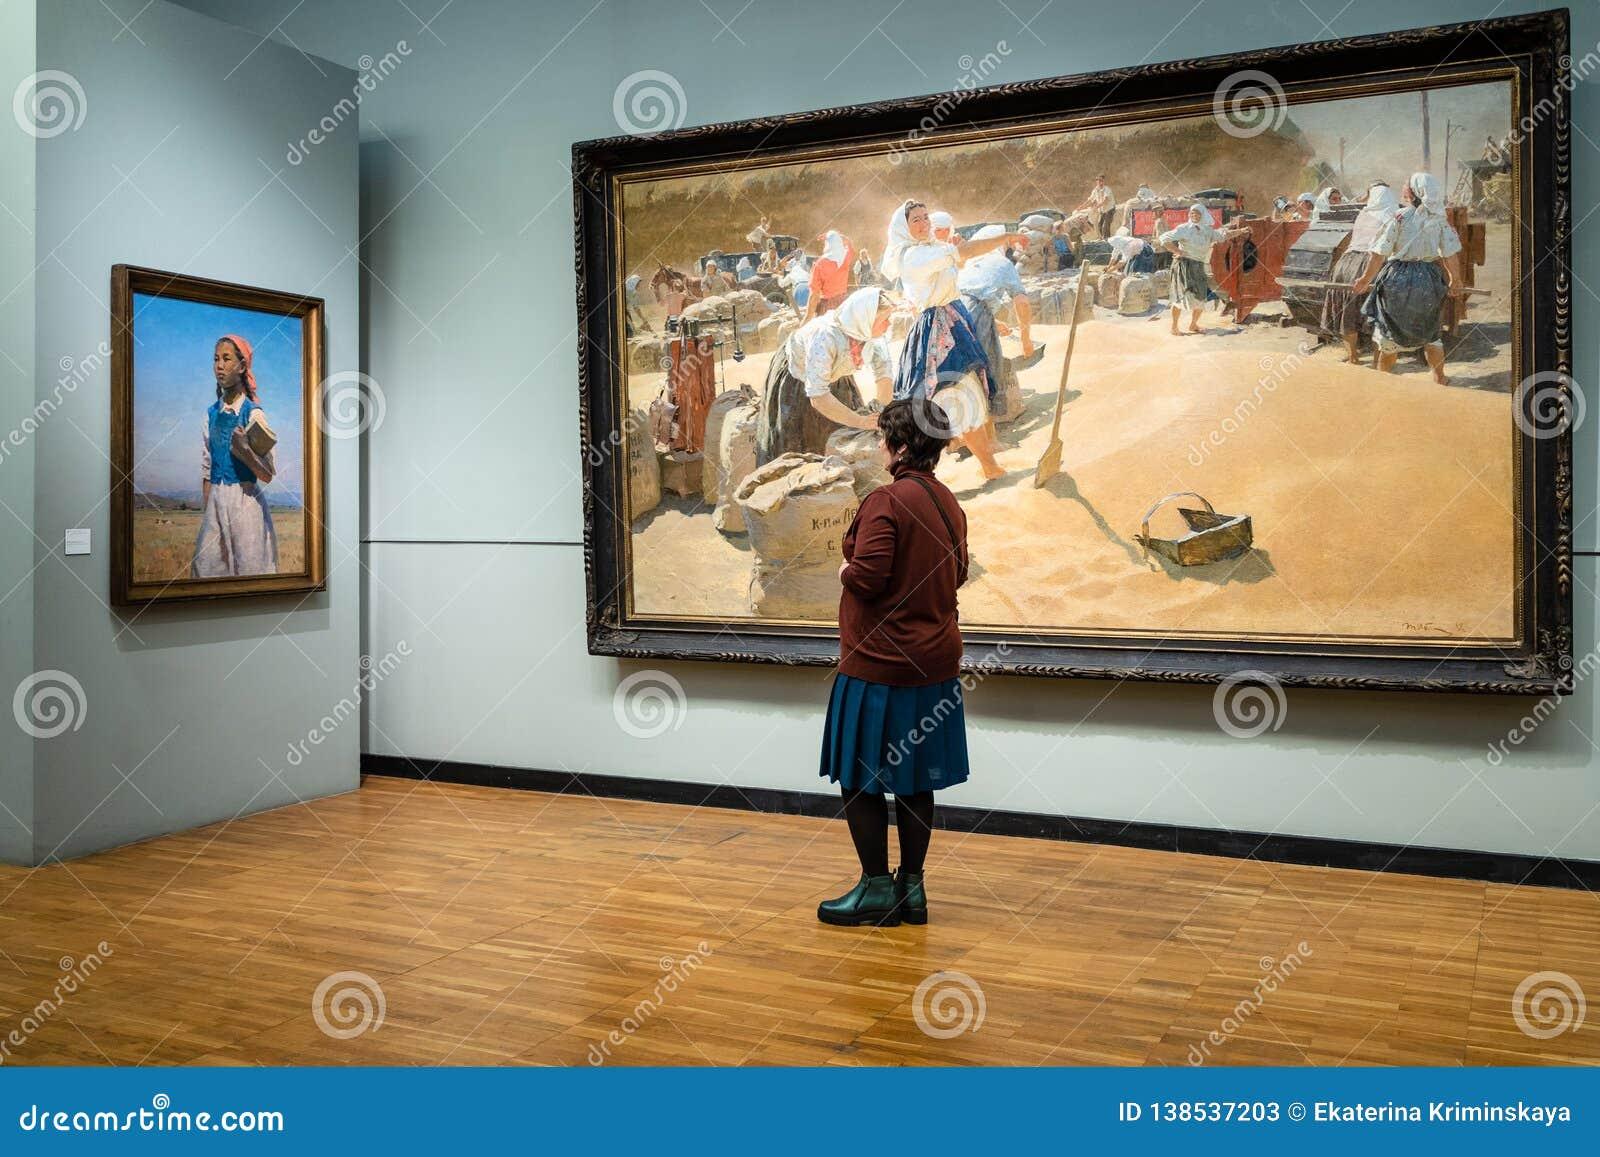 Moscow Modern Art Gallery